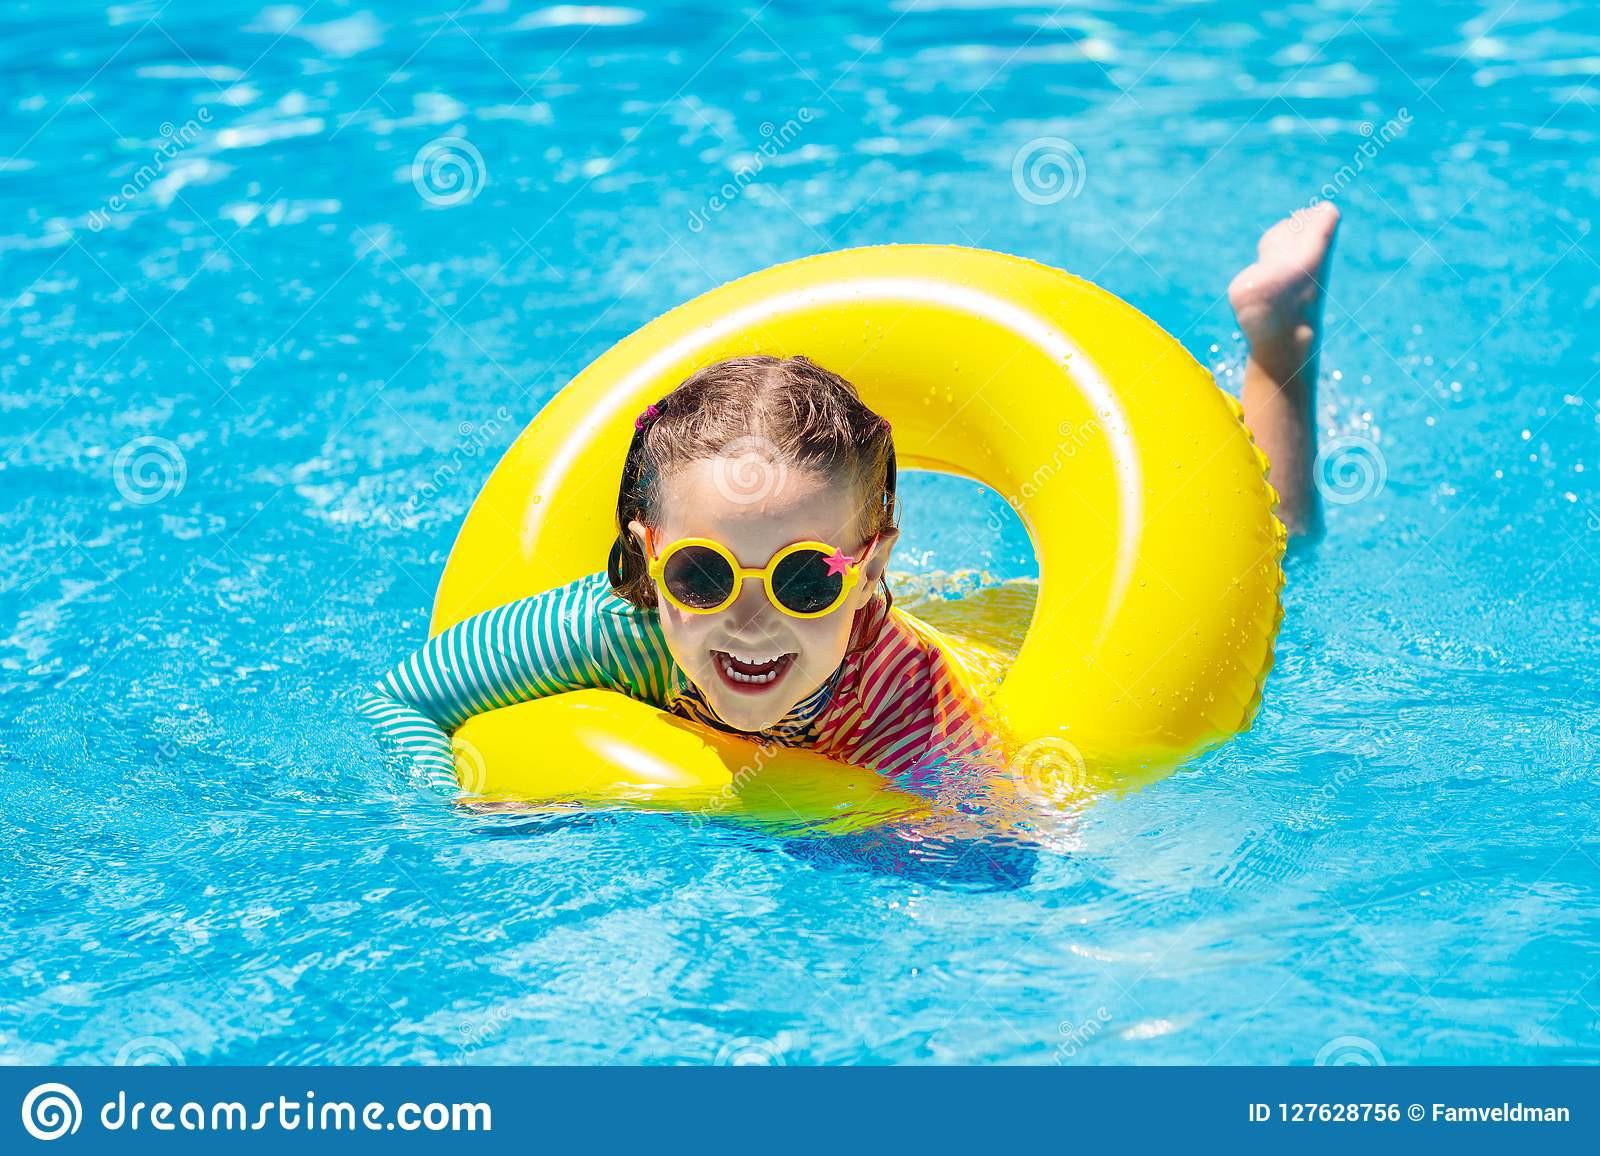 Kids Outdoor Swimming Pool  Child In Swimming Pool Kids Swim Water Play Stock